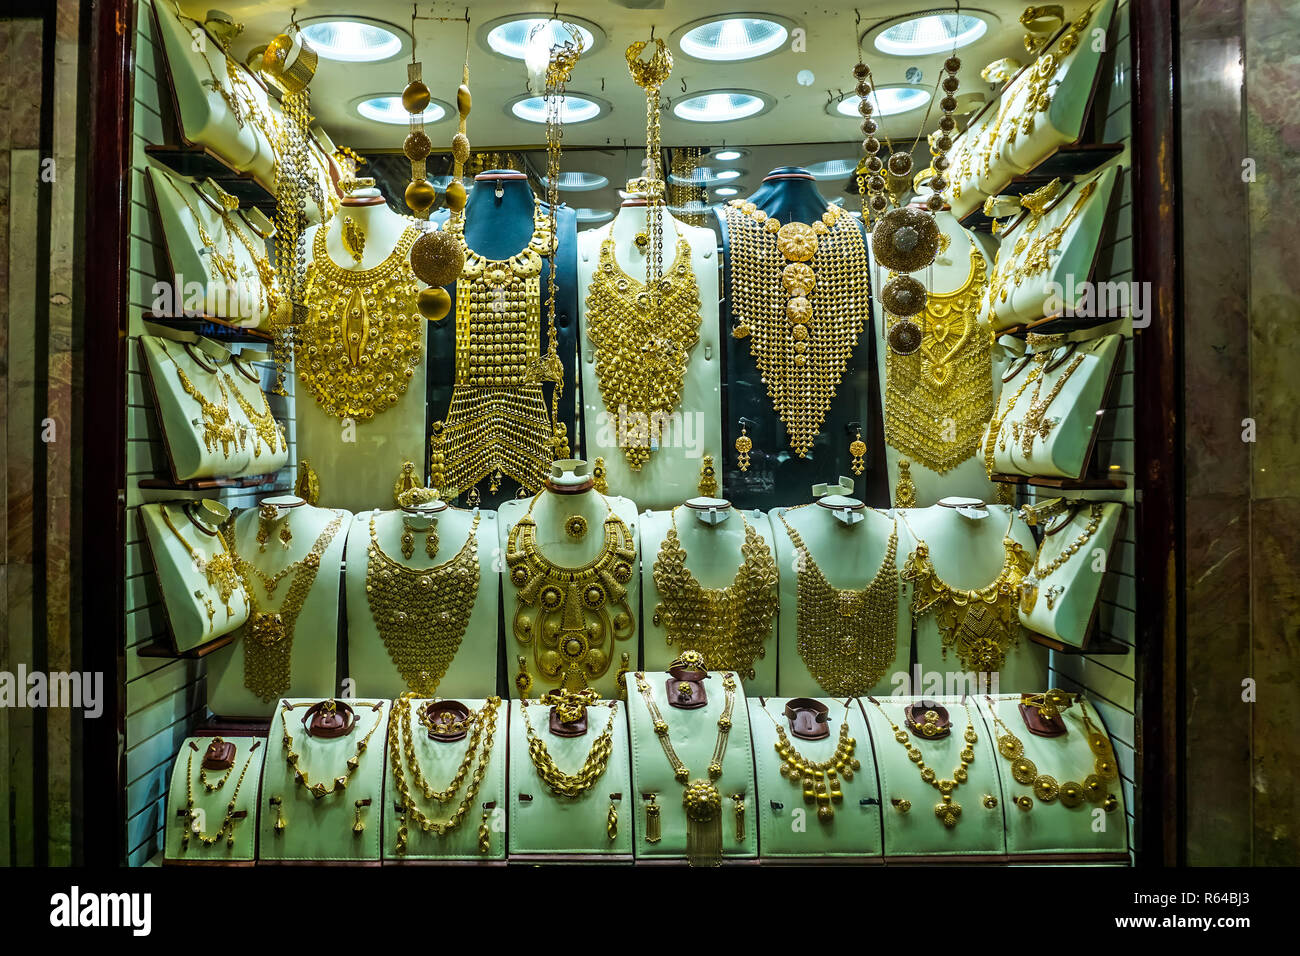 Dubai Gold Souk Jewelry Decoration Ornament at a Shop Showcase - Stock Image